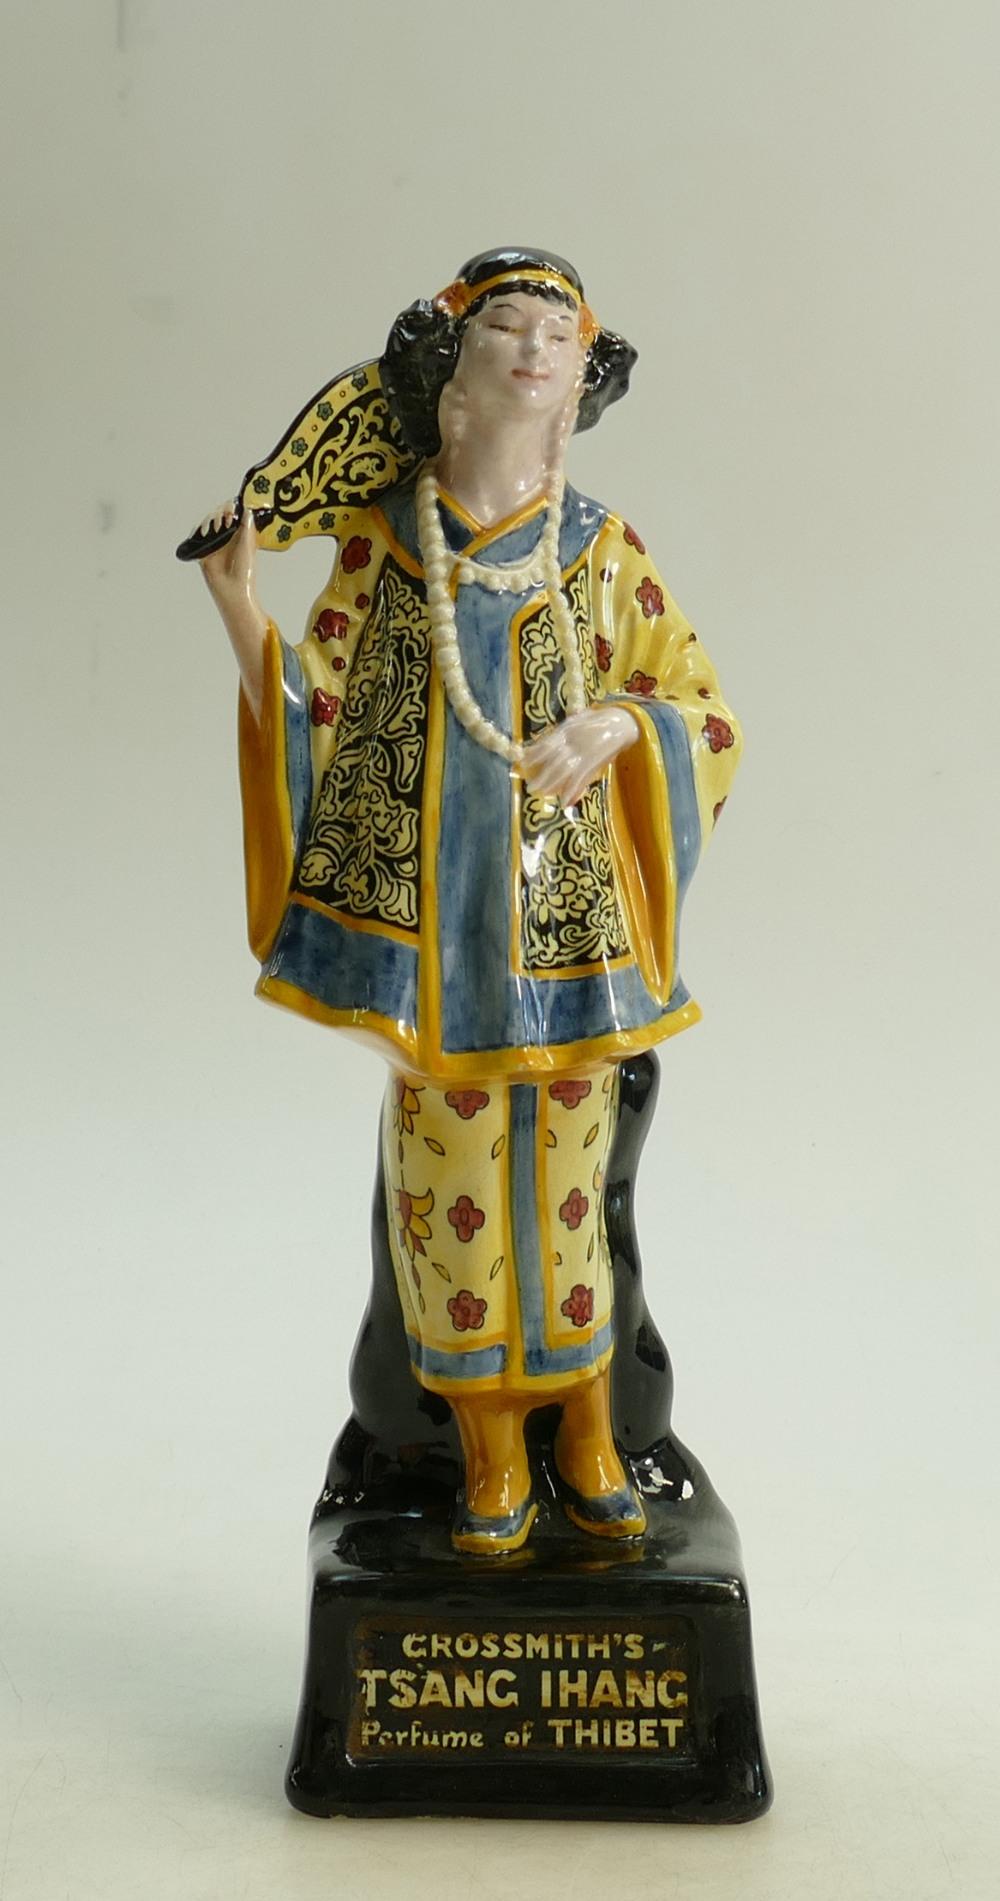 Lot 53 - Royal Doulton advertising figure Grossmith's Tsang Ihang: Royal Doulton advertising figure,